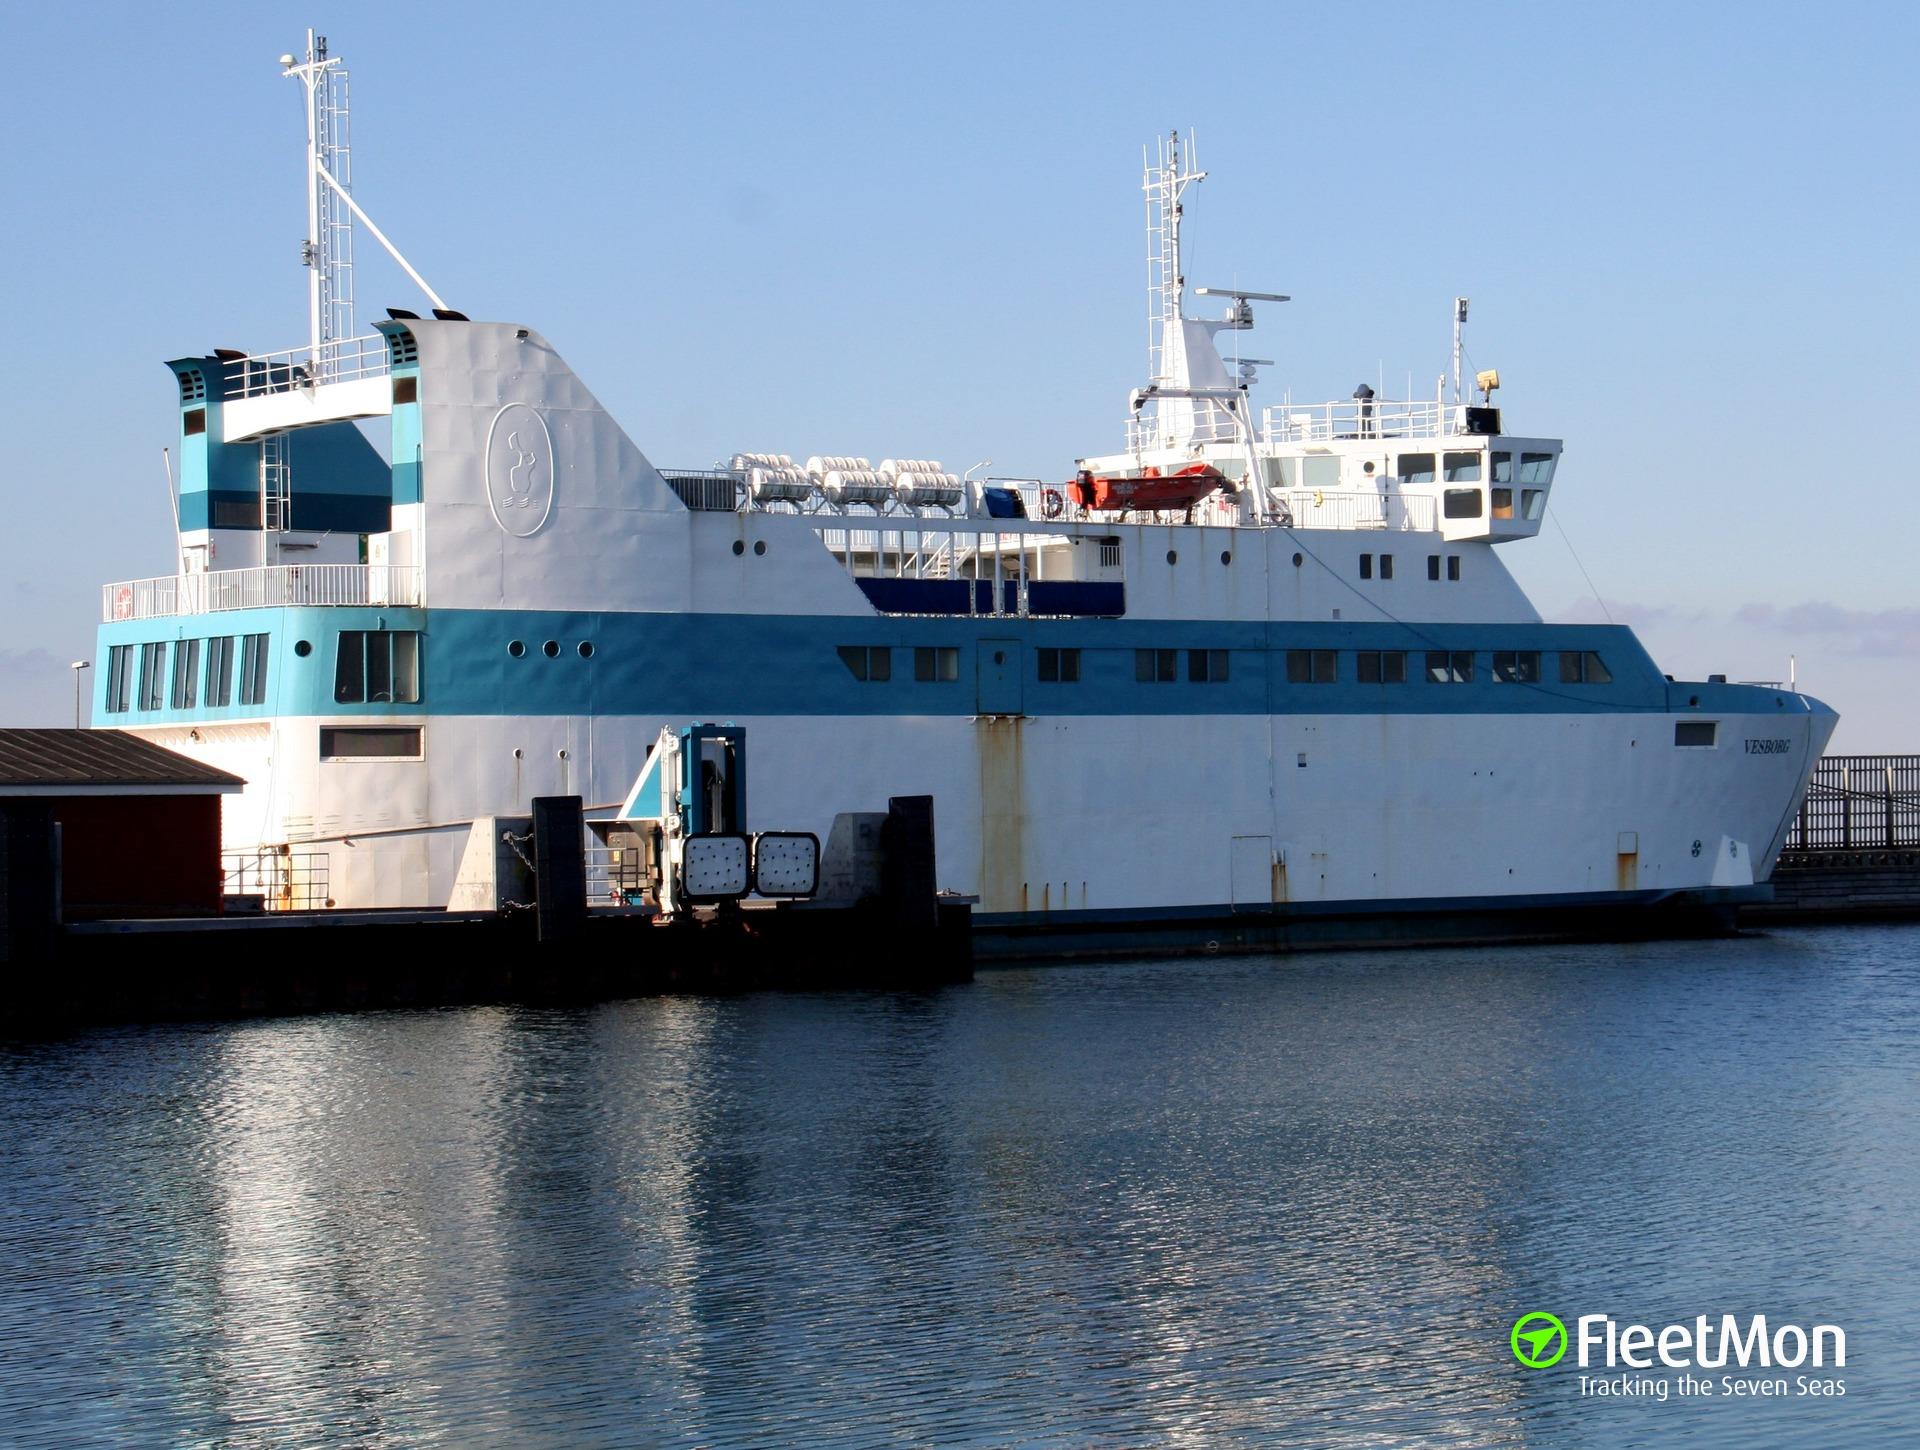 Ferry ANE LAESOE grounding